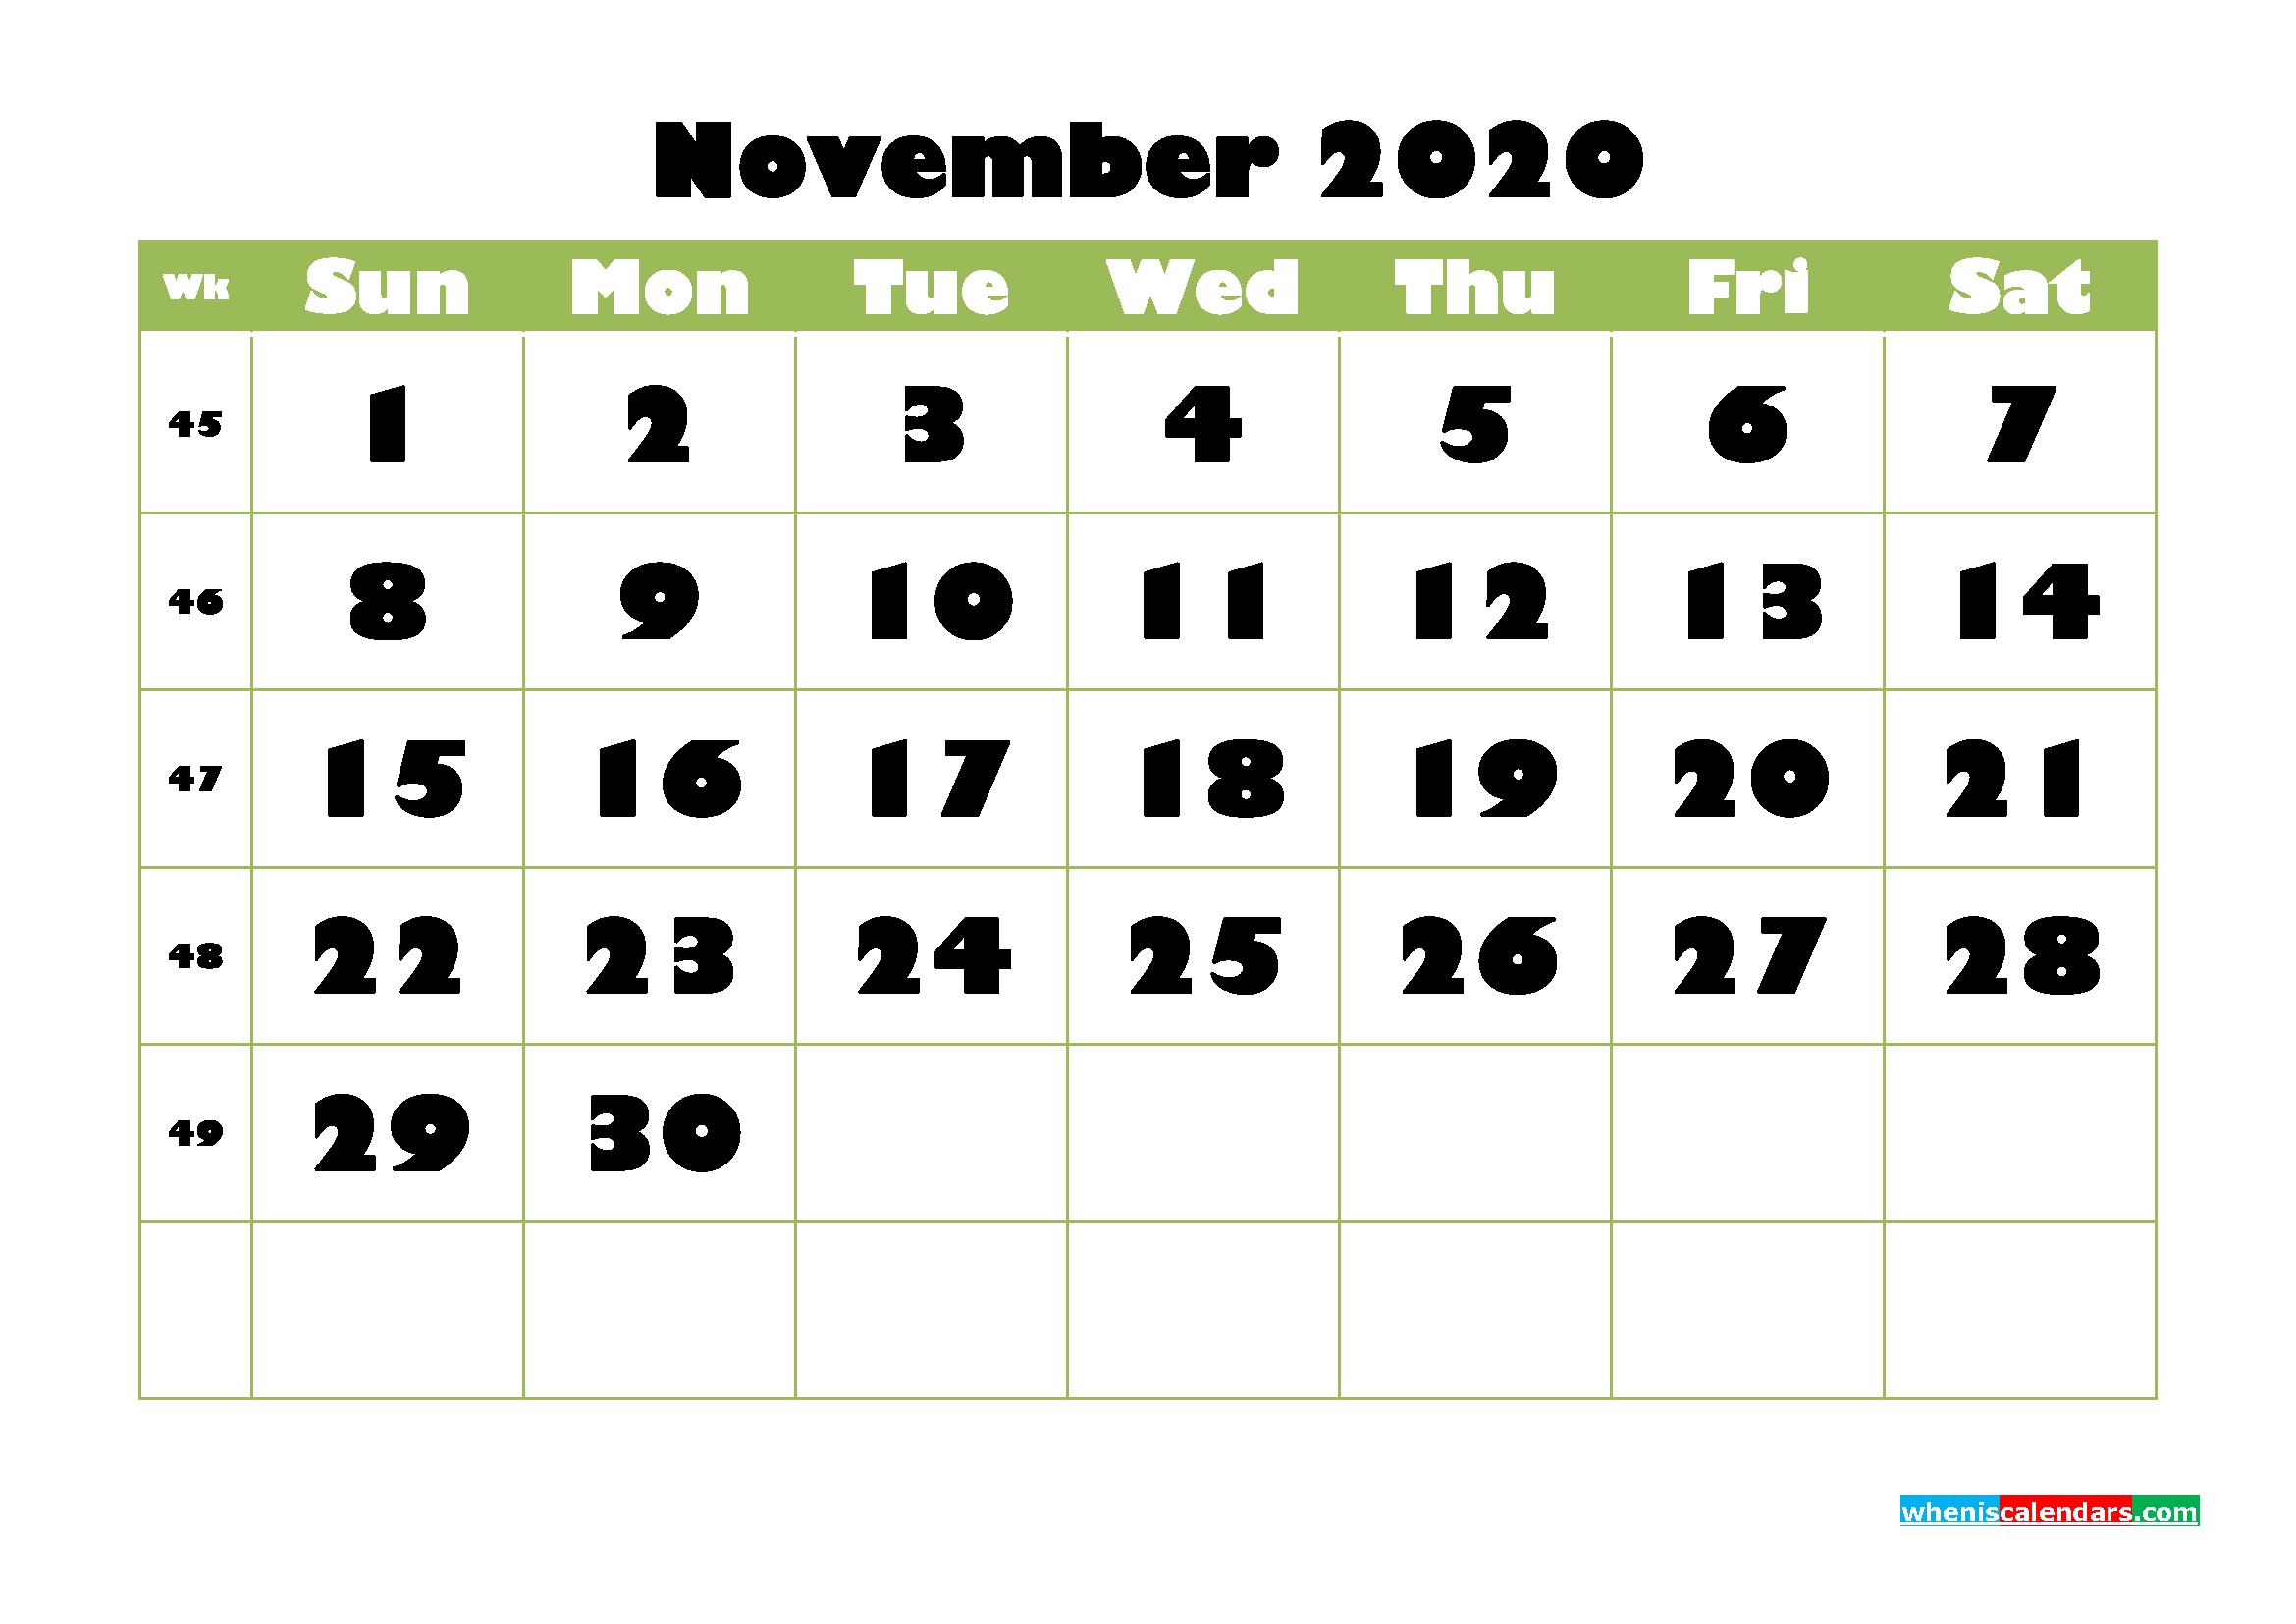 November Printable Calendar 2020 PDF, Word - No.m20b743